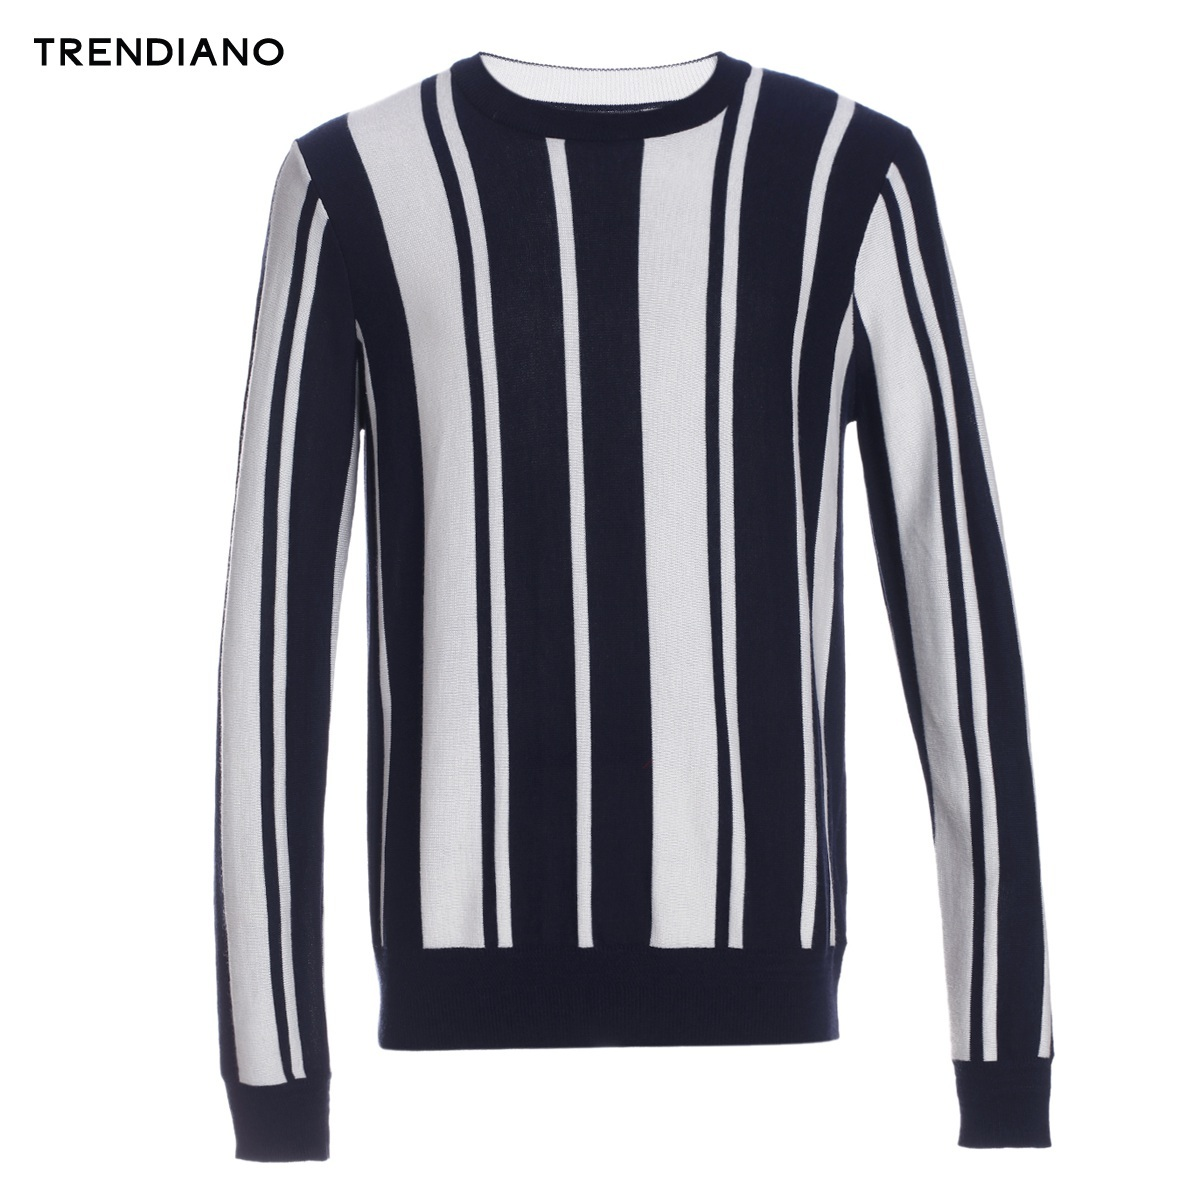 TRENDIANO 3HE3031720 竖条纹针织衫 144元